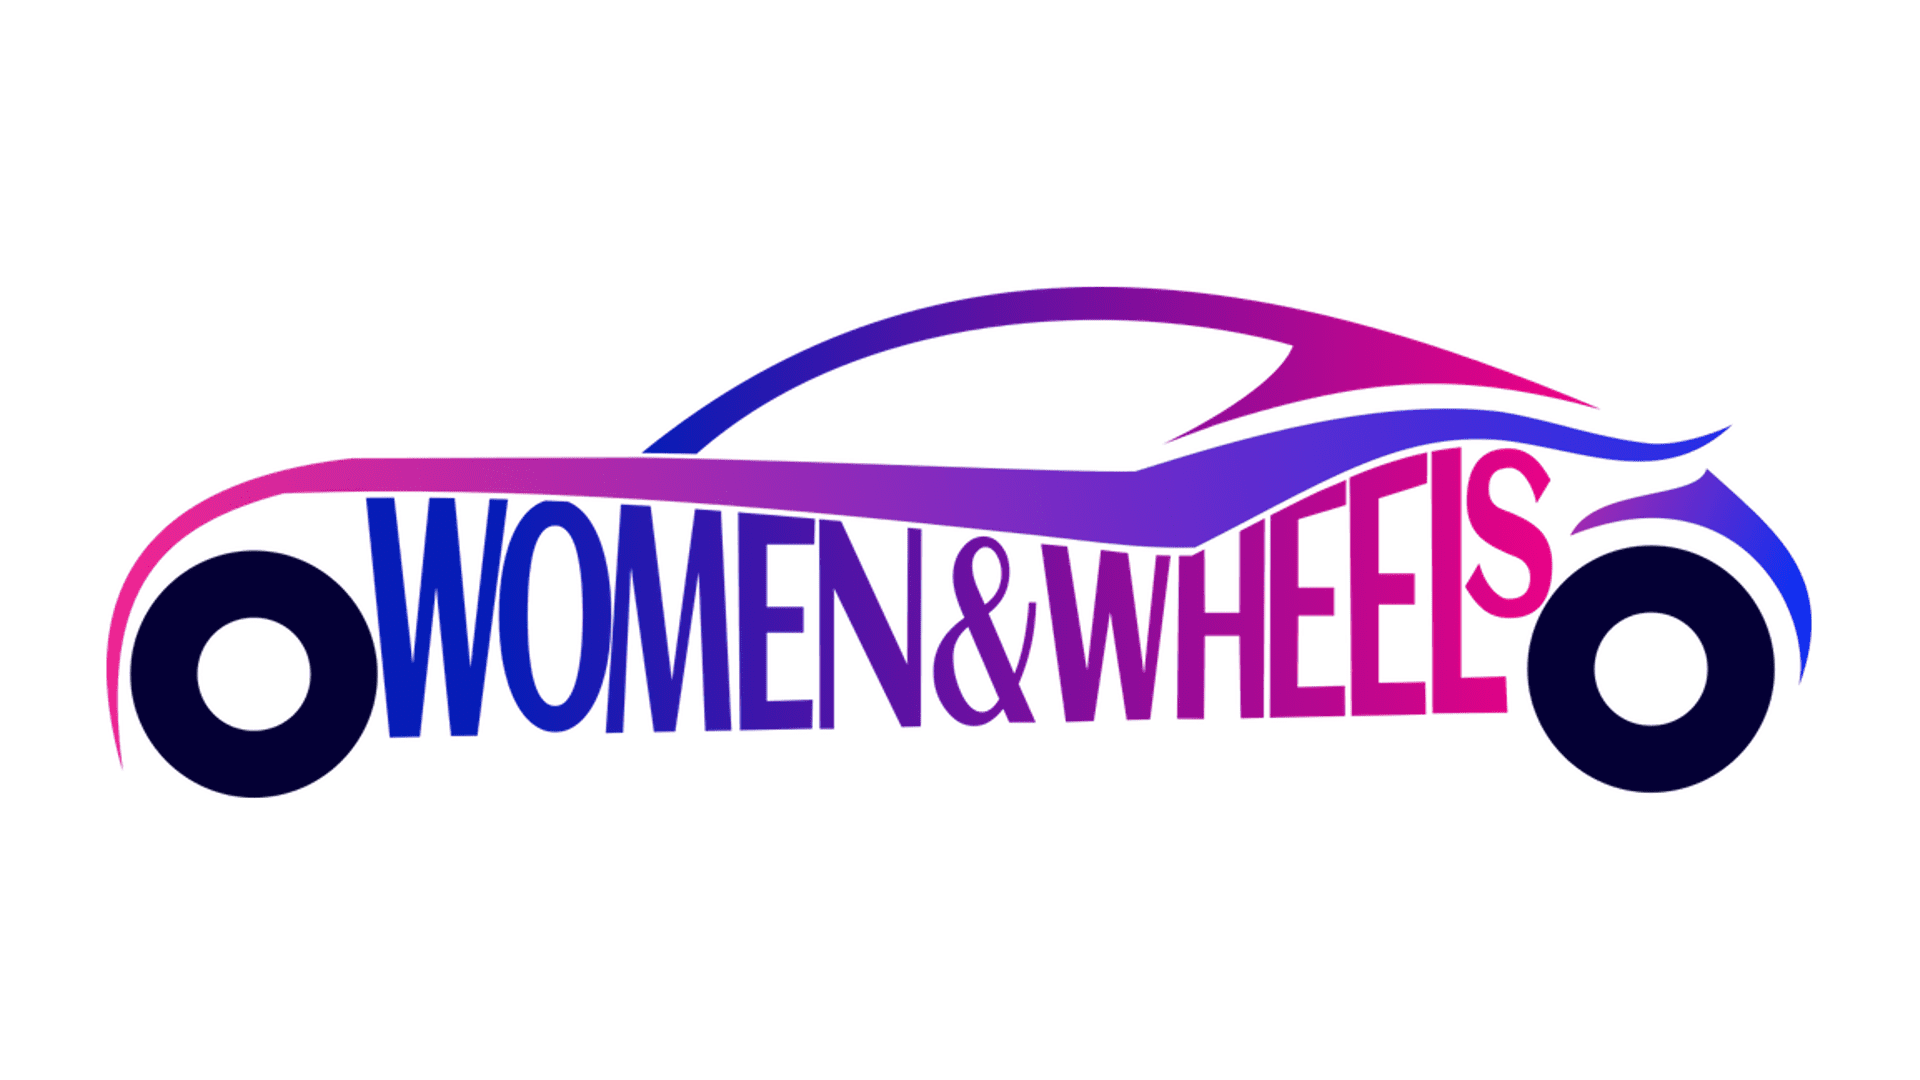 SimBin UK Announces Women and Wheels